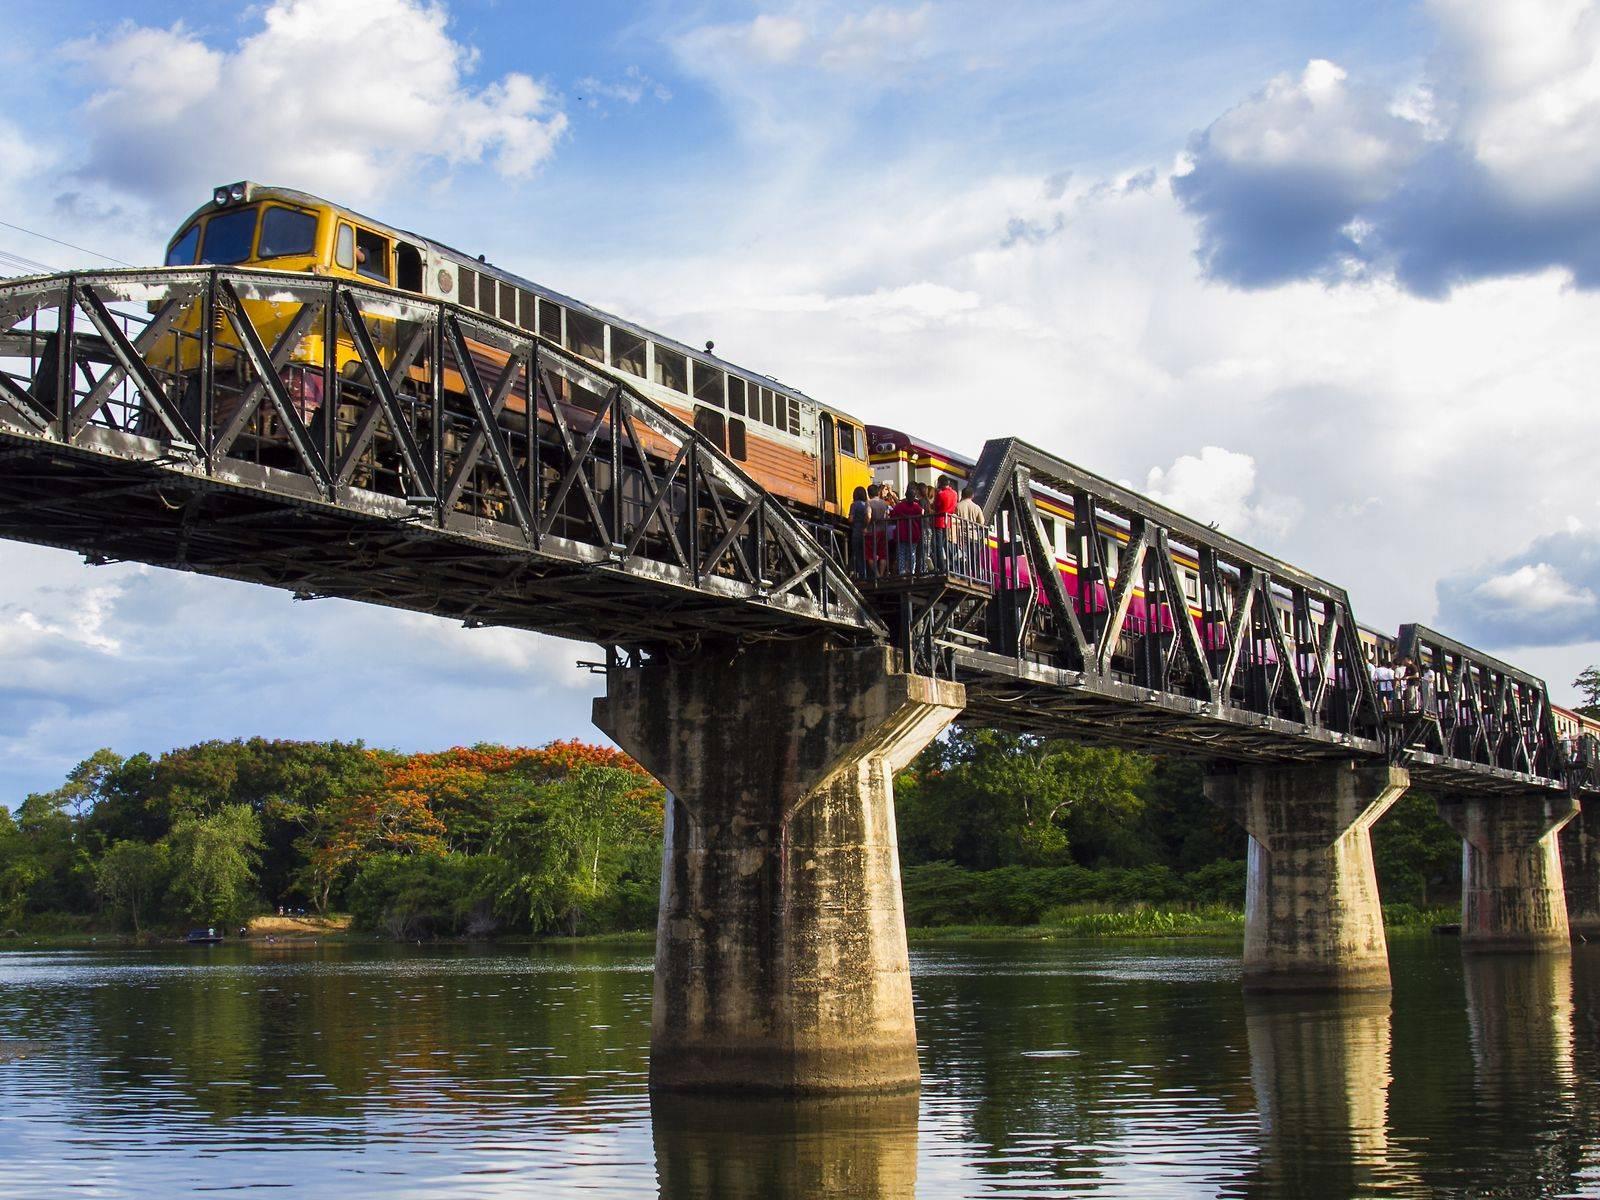 Kanchanaburi province & its historical World War II railway